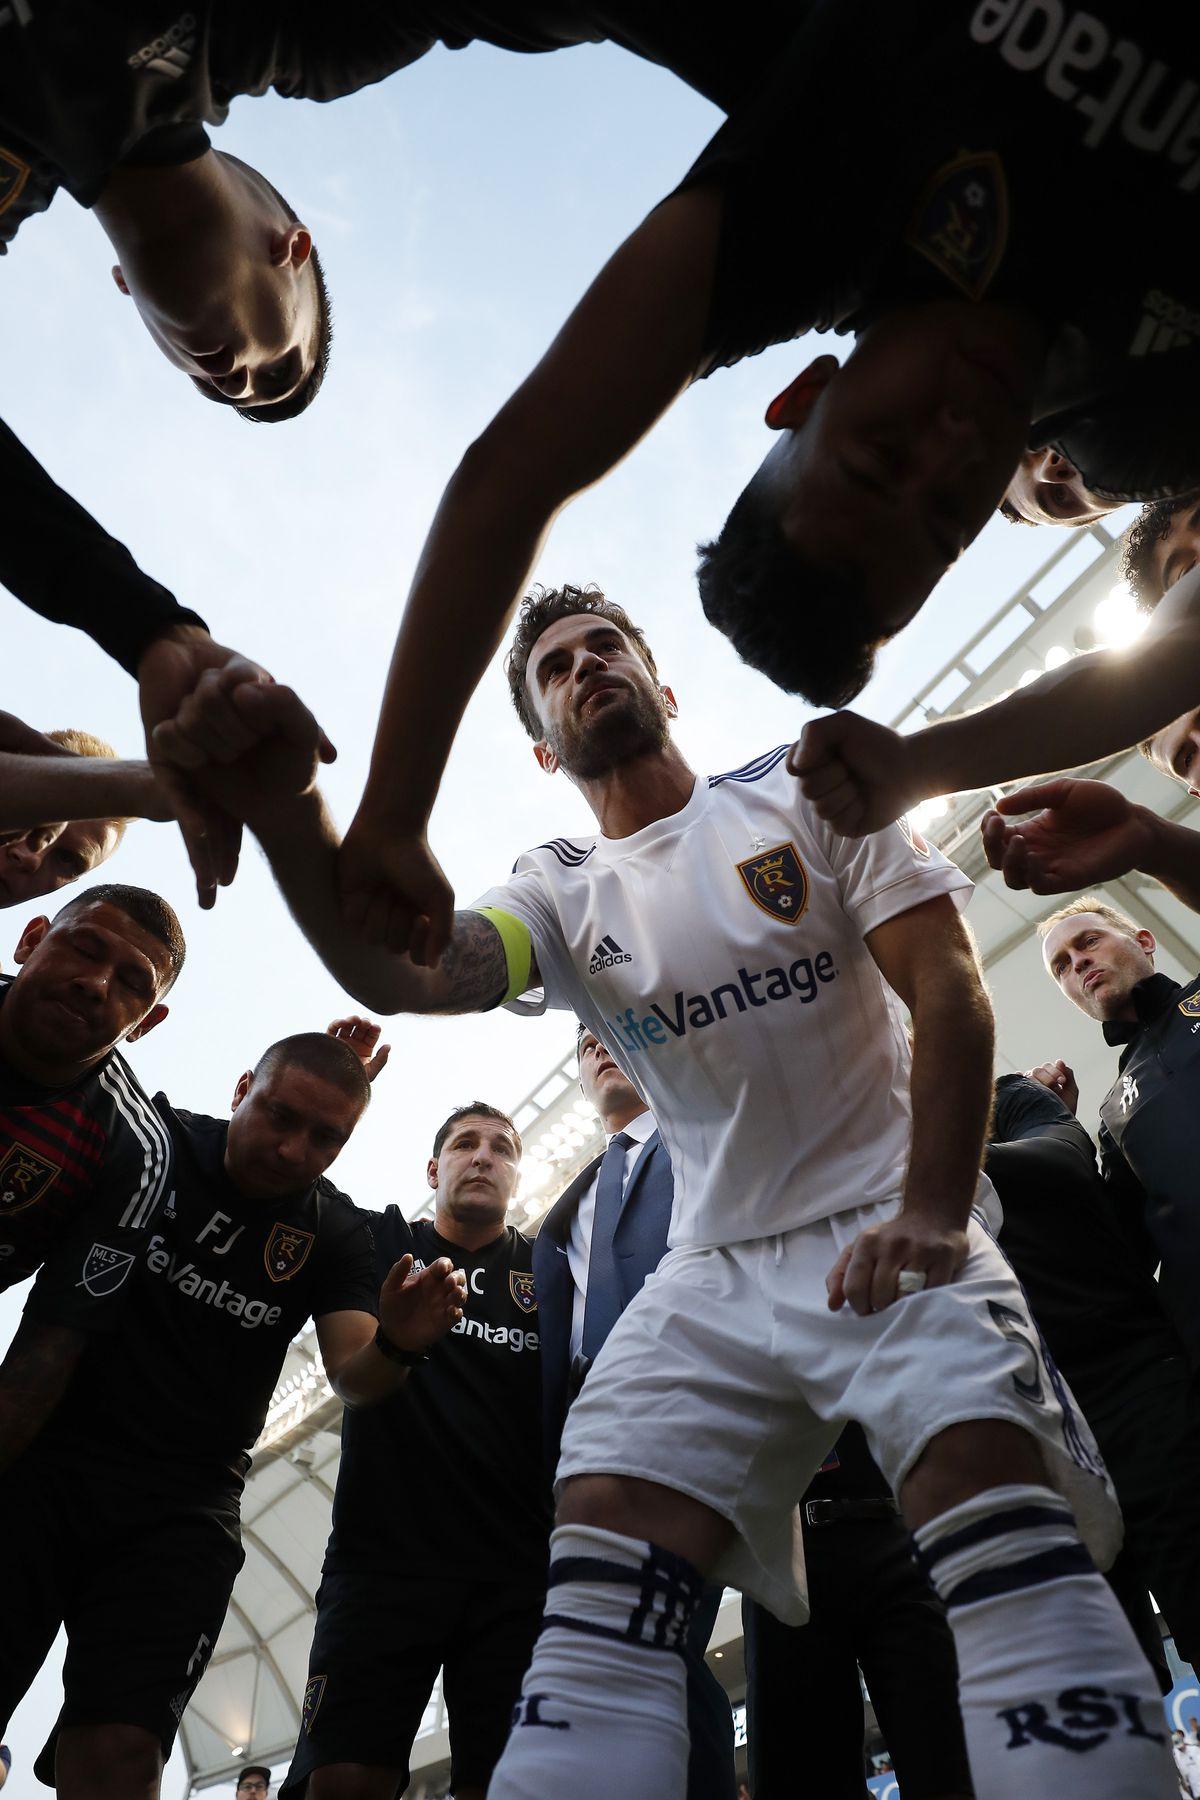 MLS: Chicago Fire at Real Salt Lake